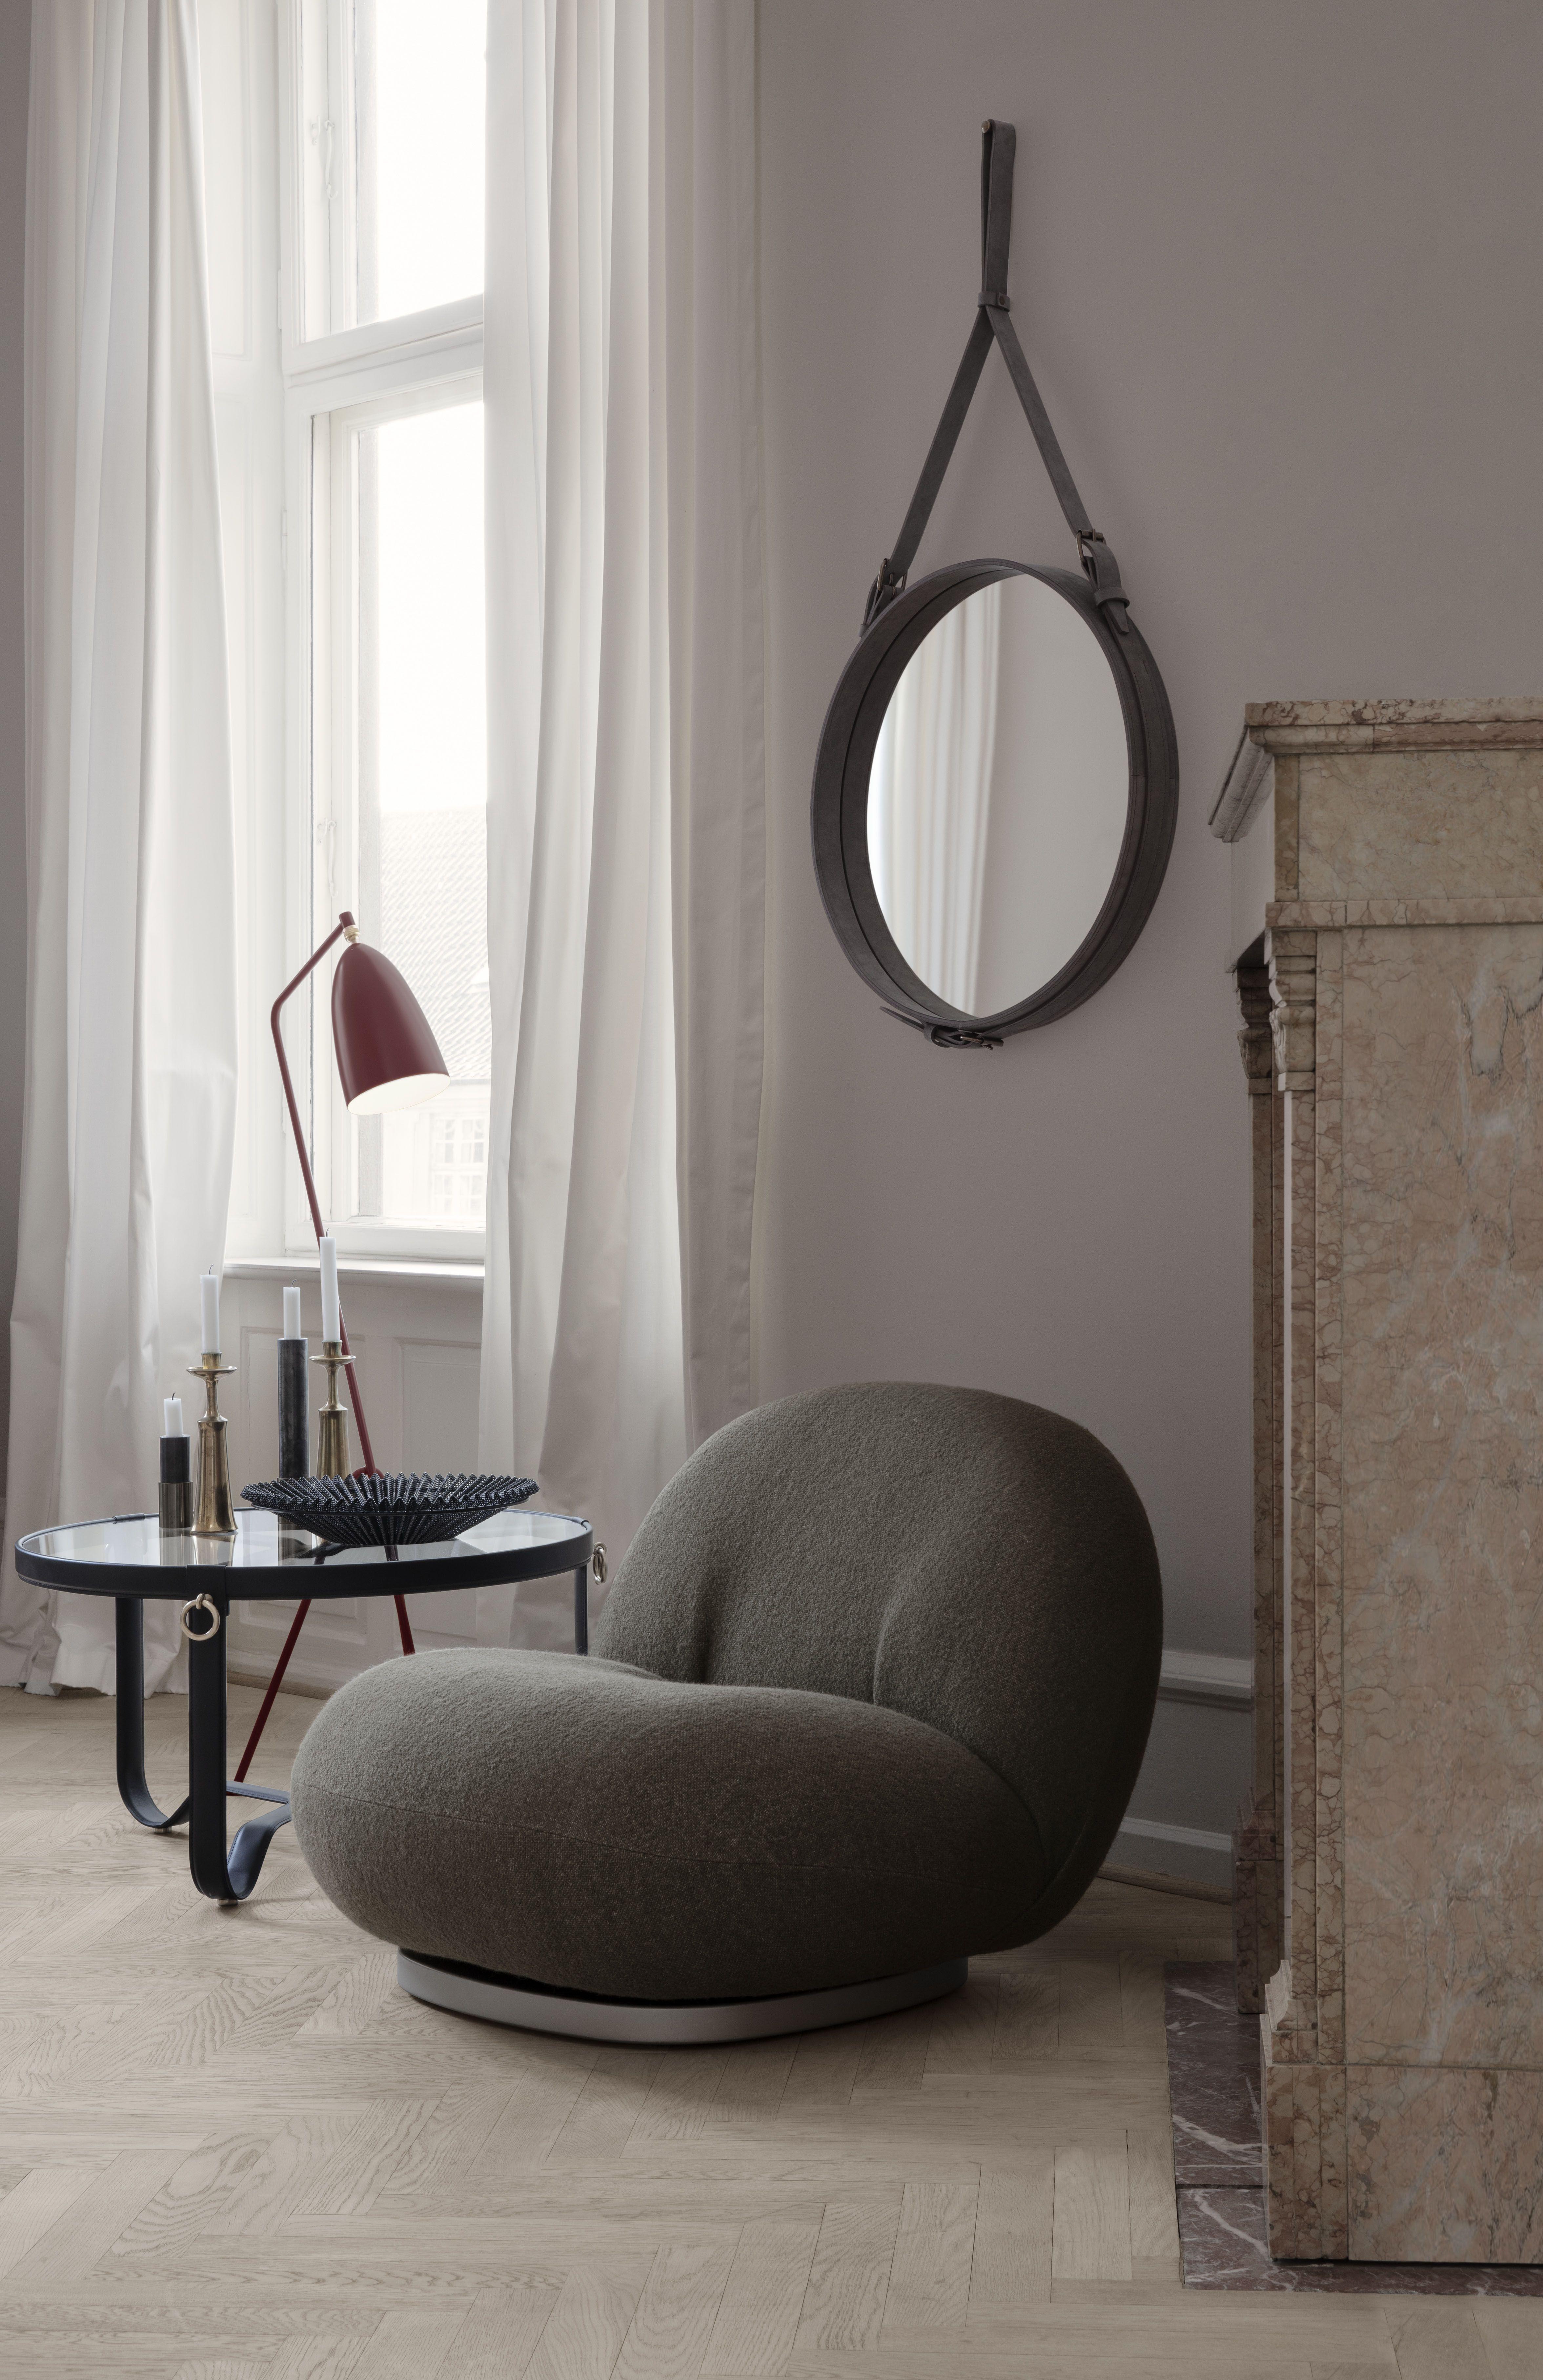 Fauteuil Pacha Pierre Paulin Blanc Made In Design Mobilier Contemporain Idees De Decor Mobilier